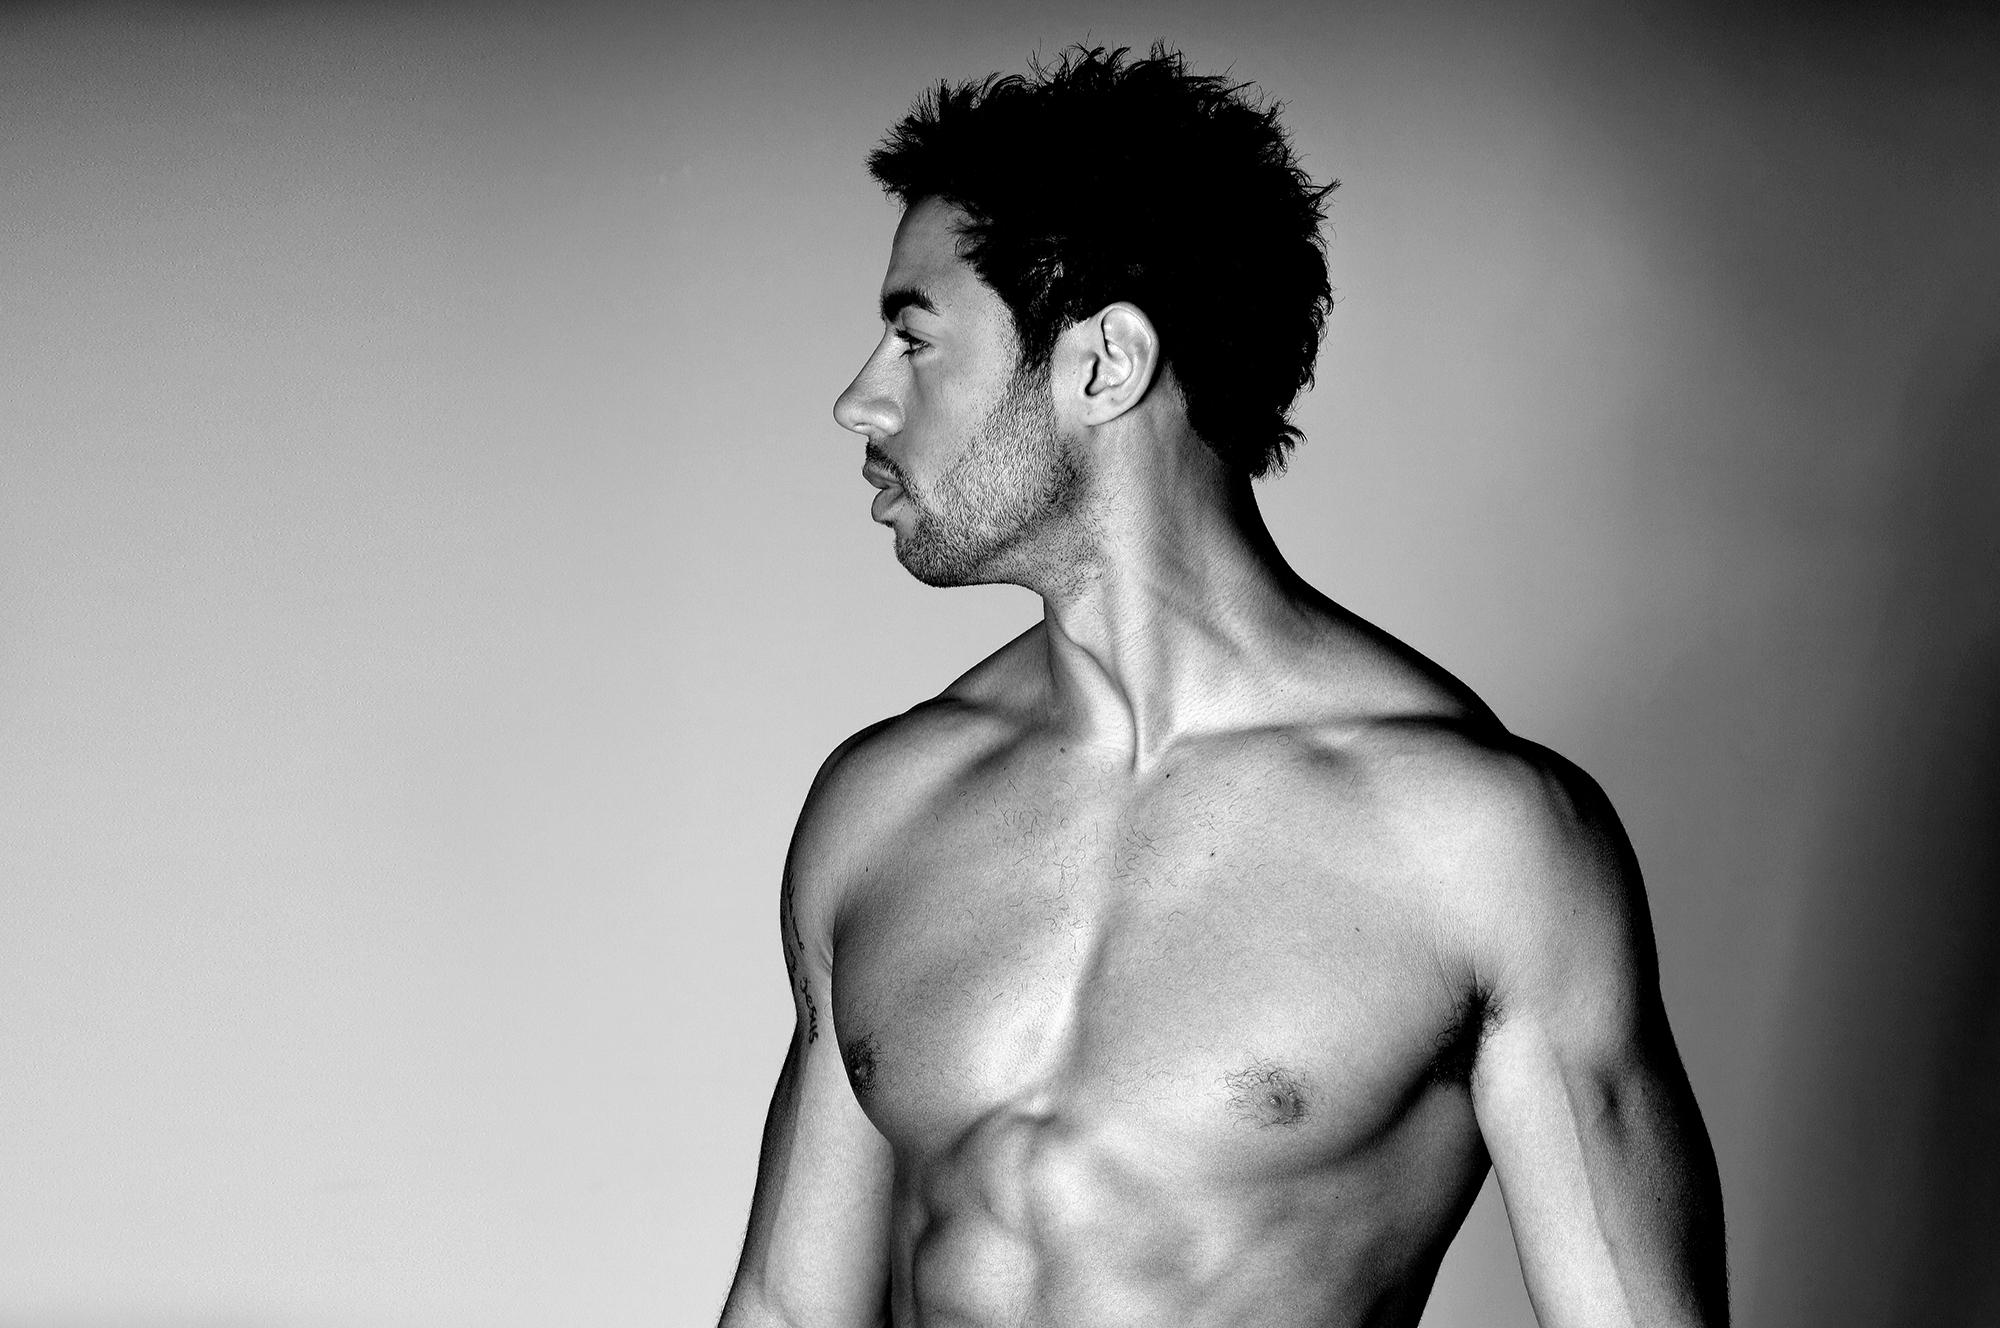 Topless male model